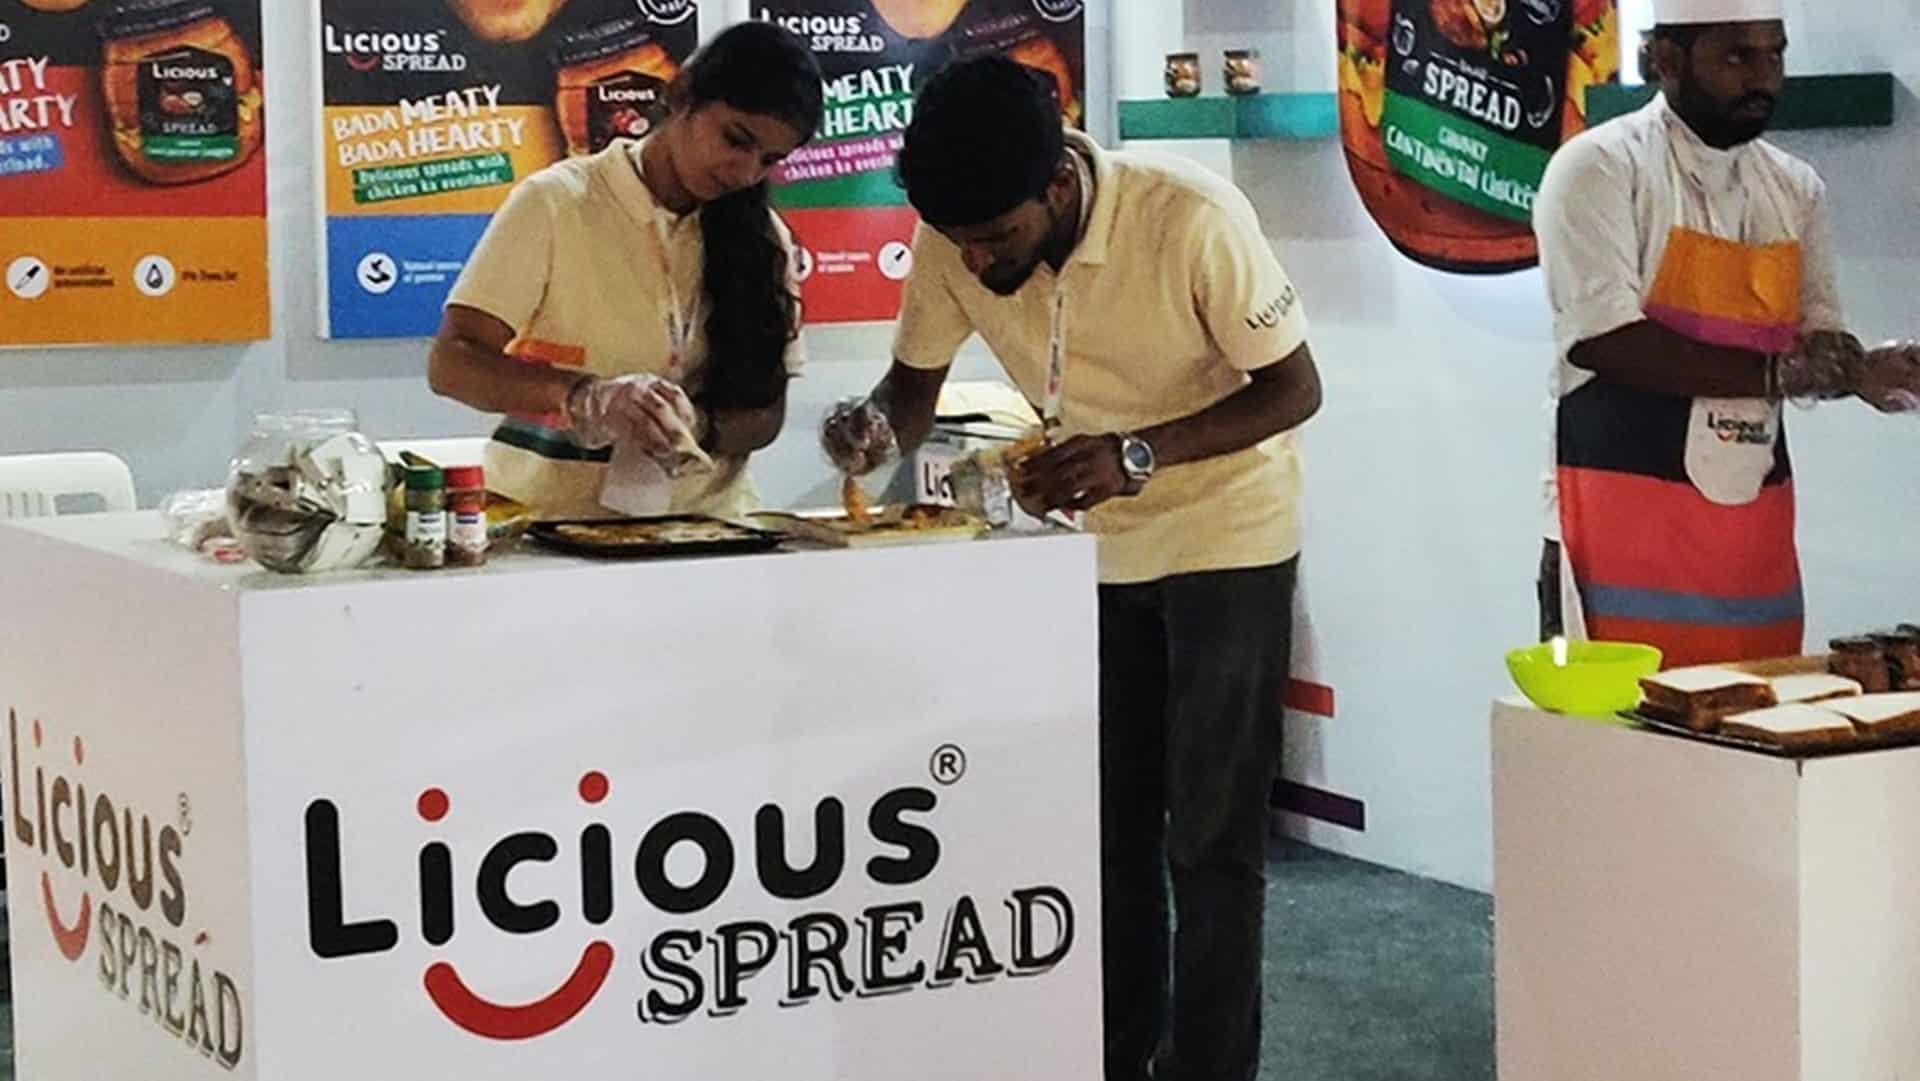 Licious raises USD 192 million series F for international expansion